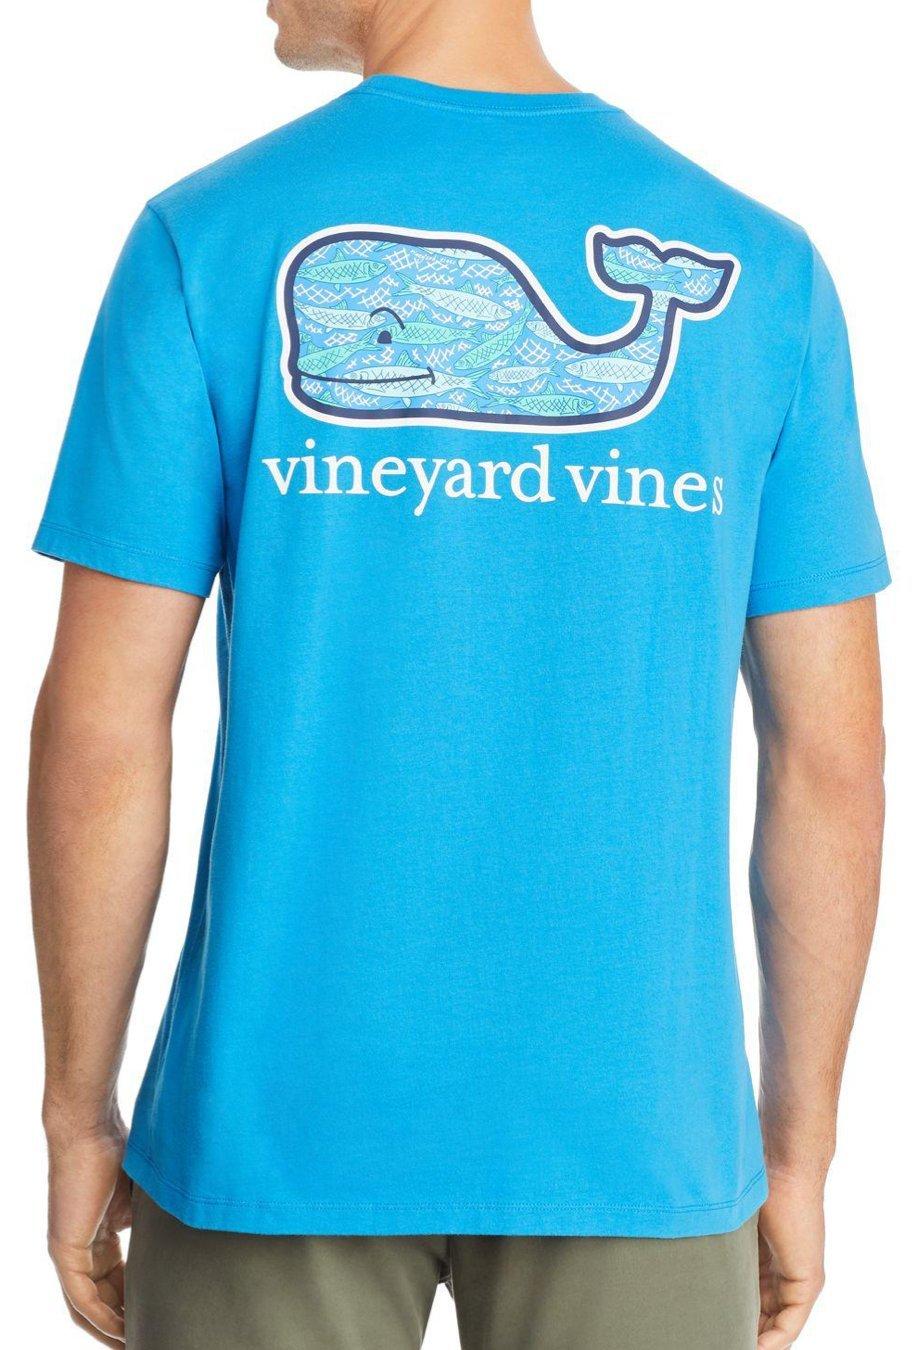 Vineyard Vinesメンズ半袖City Whale Teeシャツ B07CVMRDJW Large|Blue Fish Whale Blue Fish Whale Large